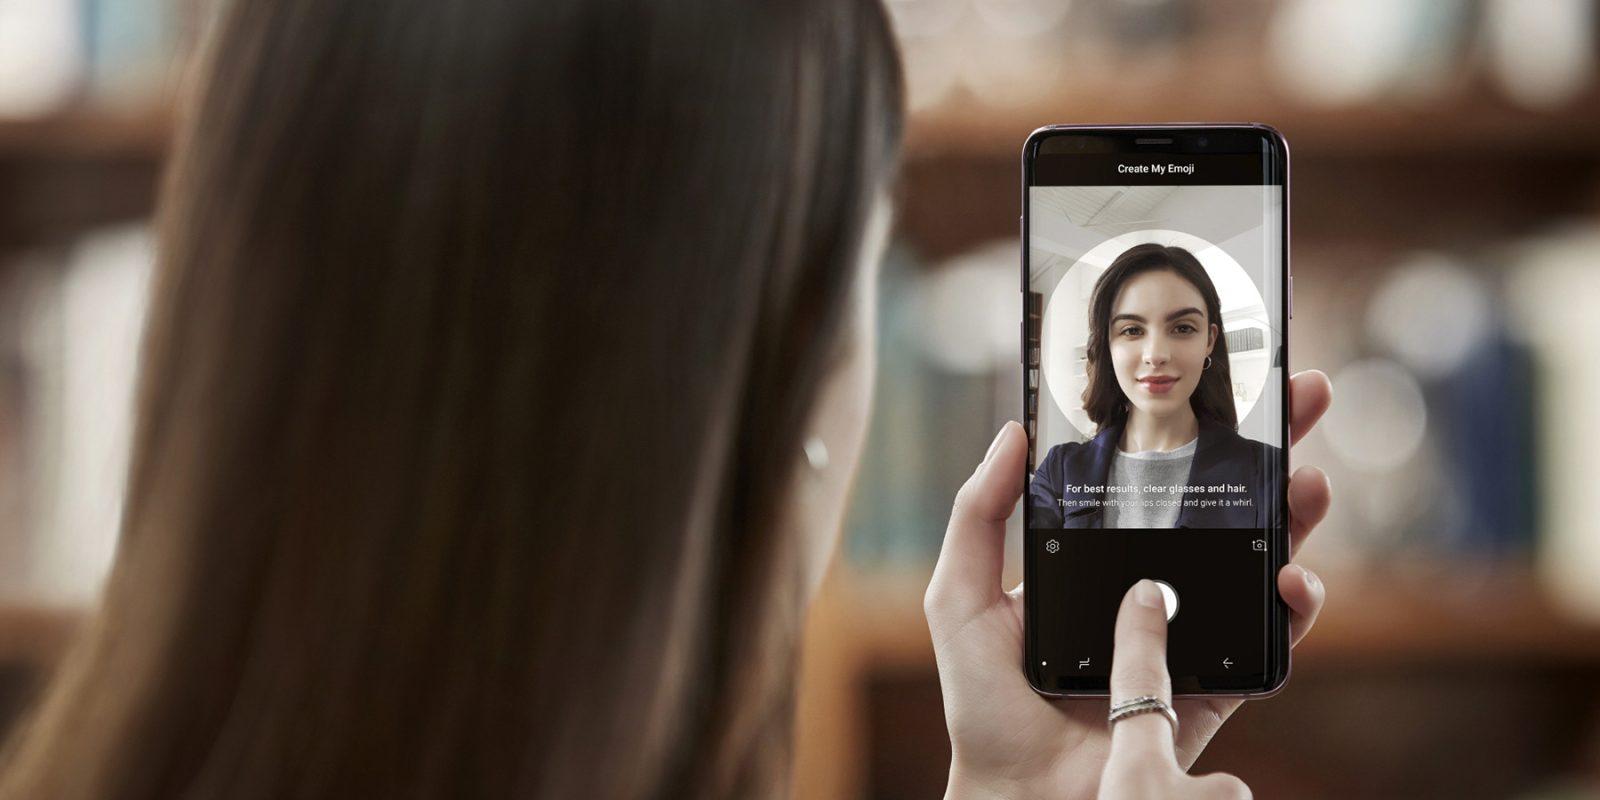 Samsung AR Emoji update offers more fine tuning, improved